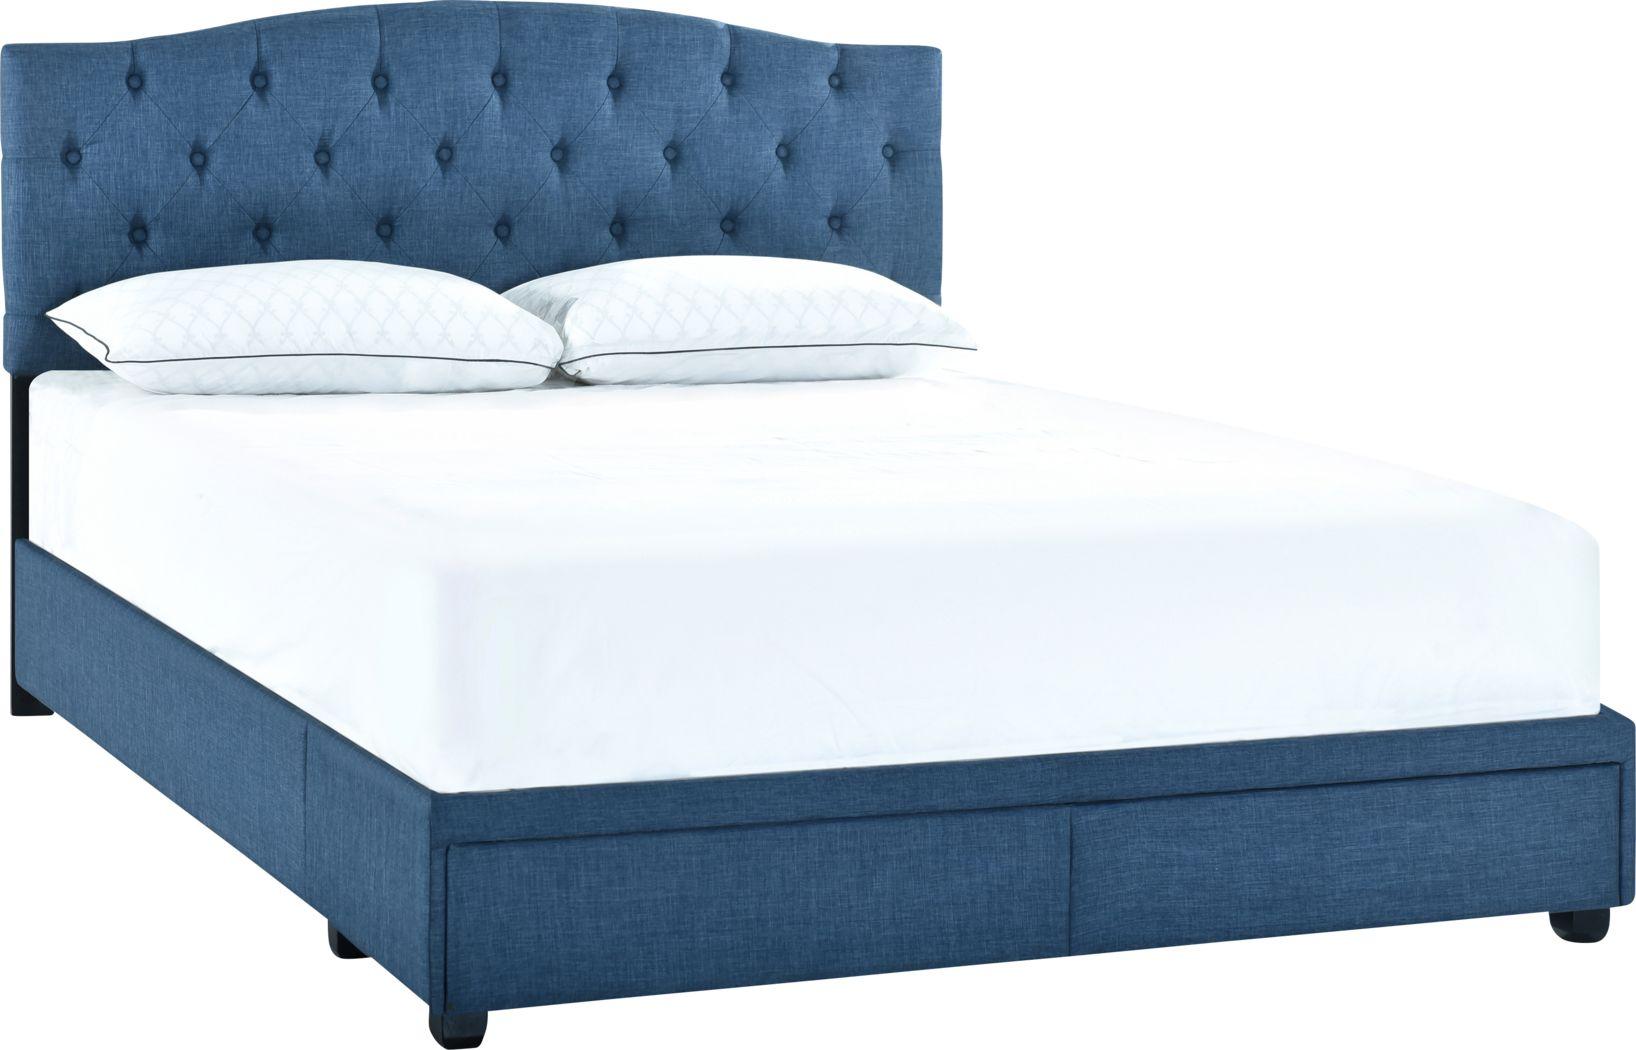 Hinesville Blue Queen Bed